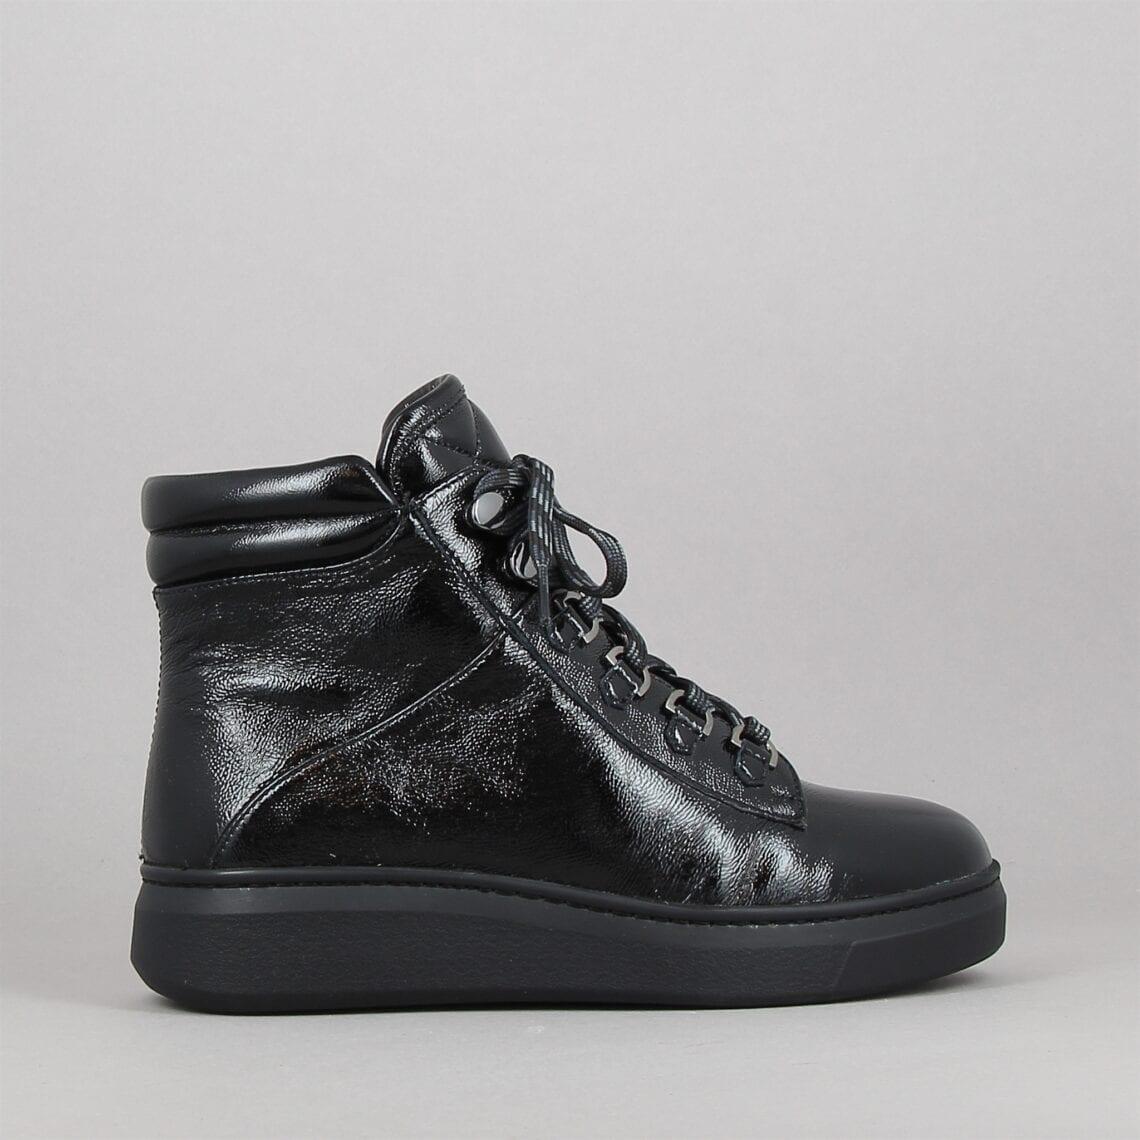 fontana-noir-182910978-0.jpg